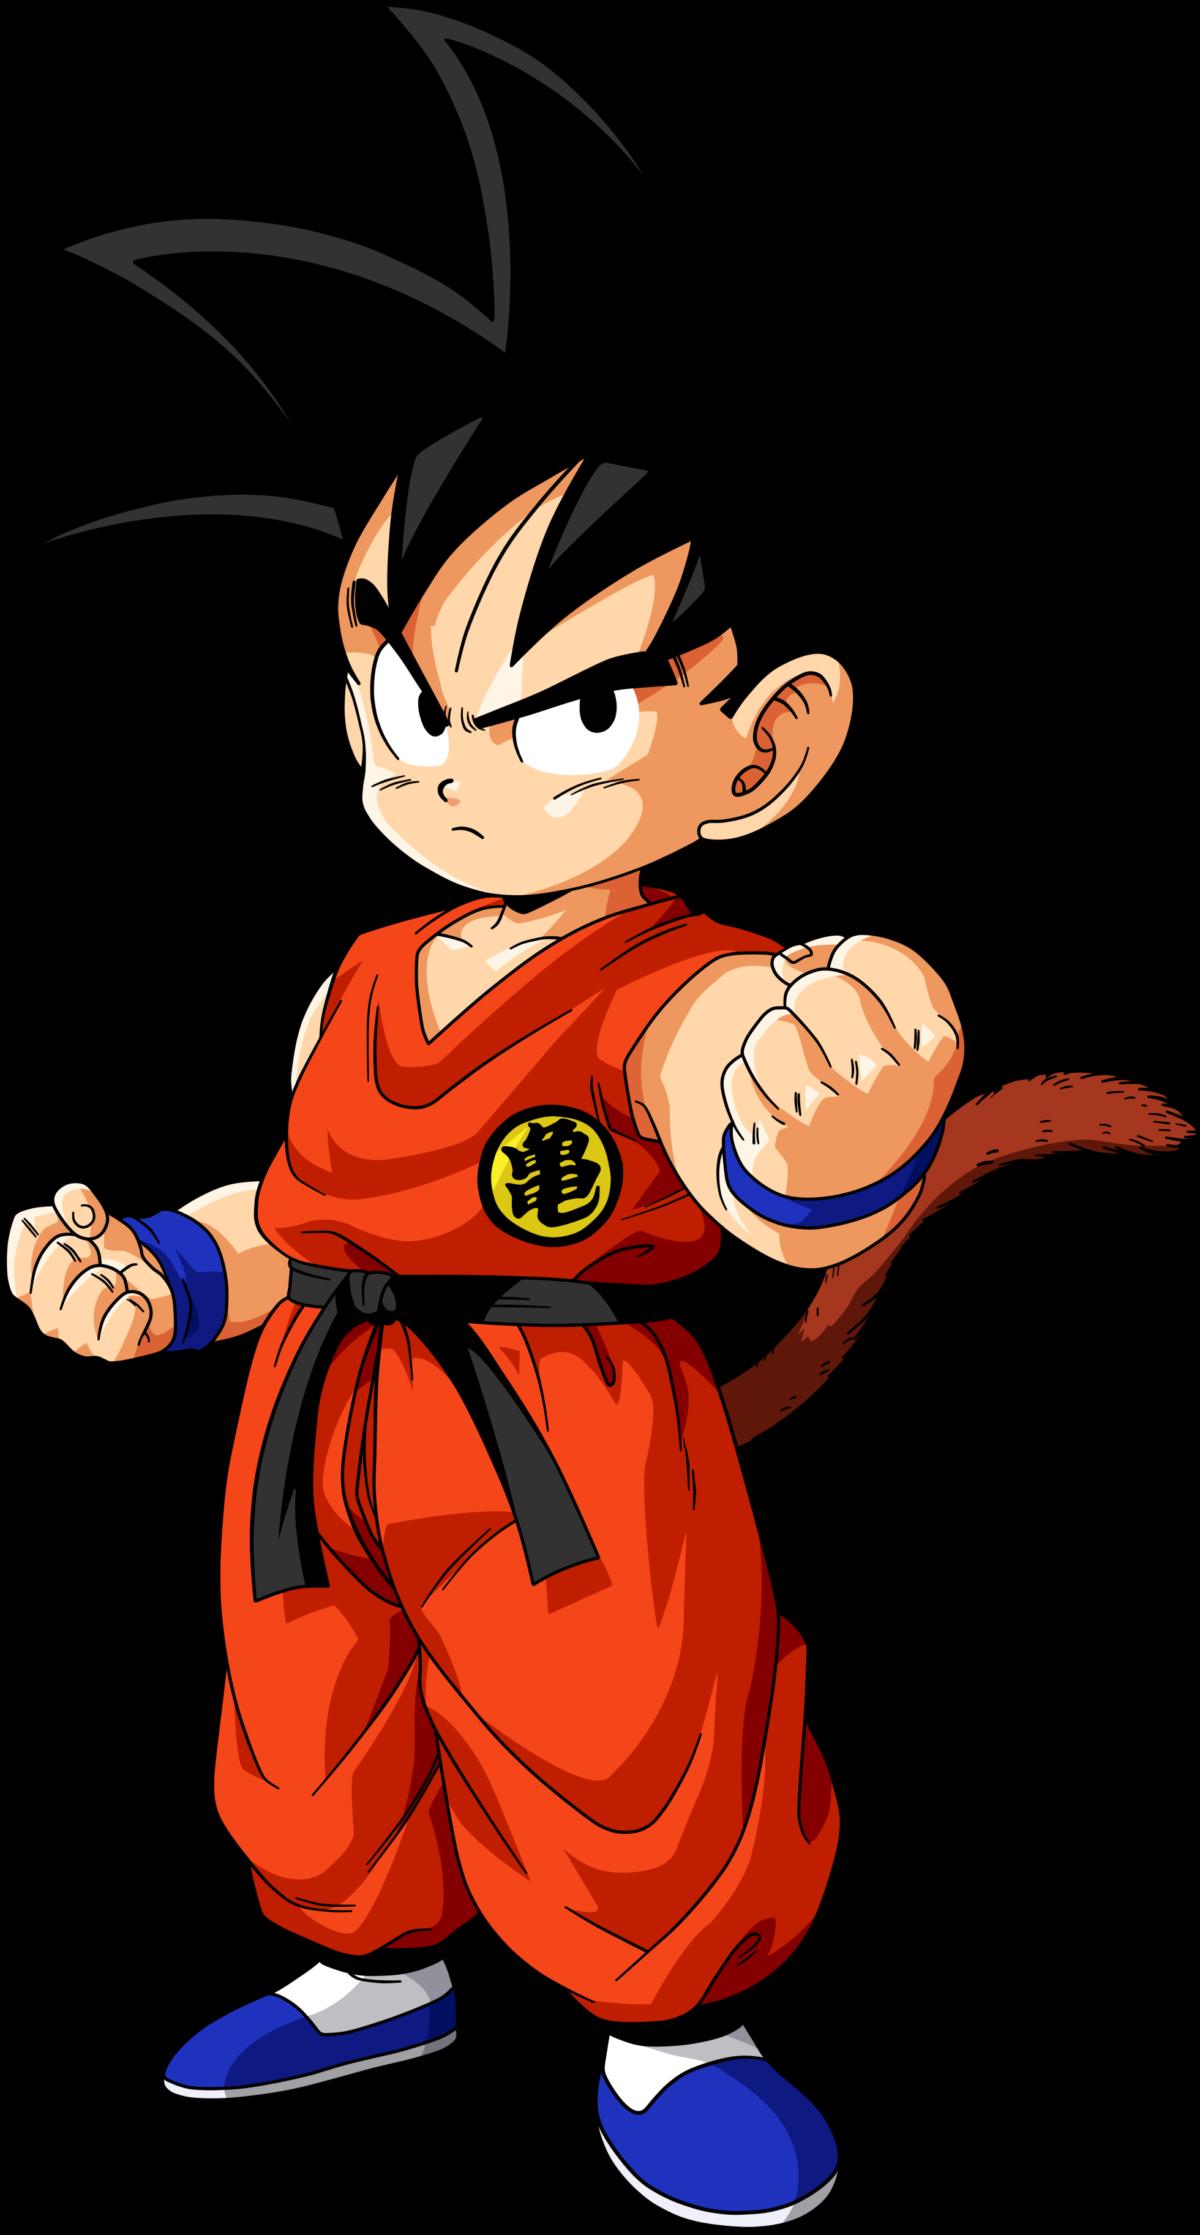 Dragon_ball_kid_goku_21_by_superjmanplay2-d5roz2f